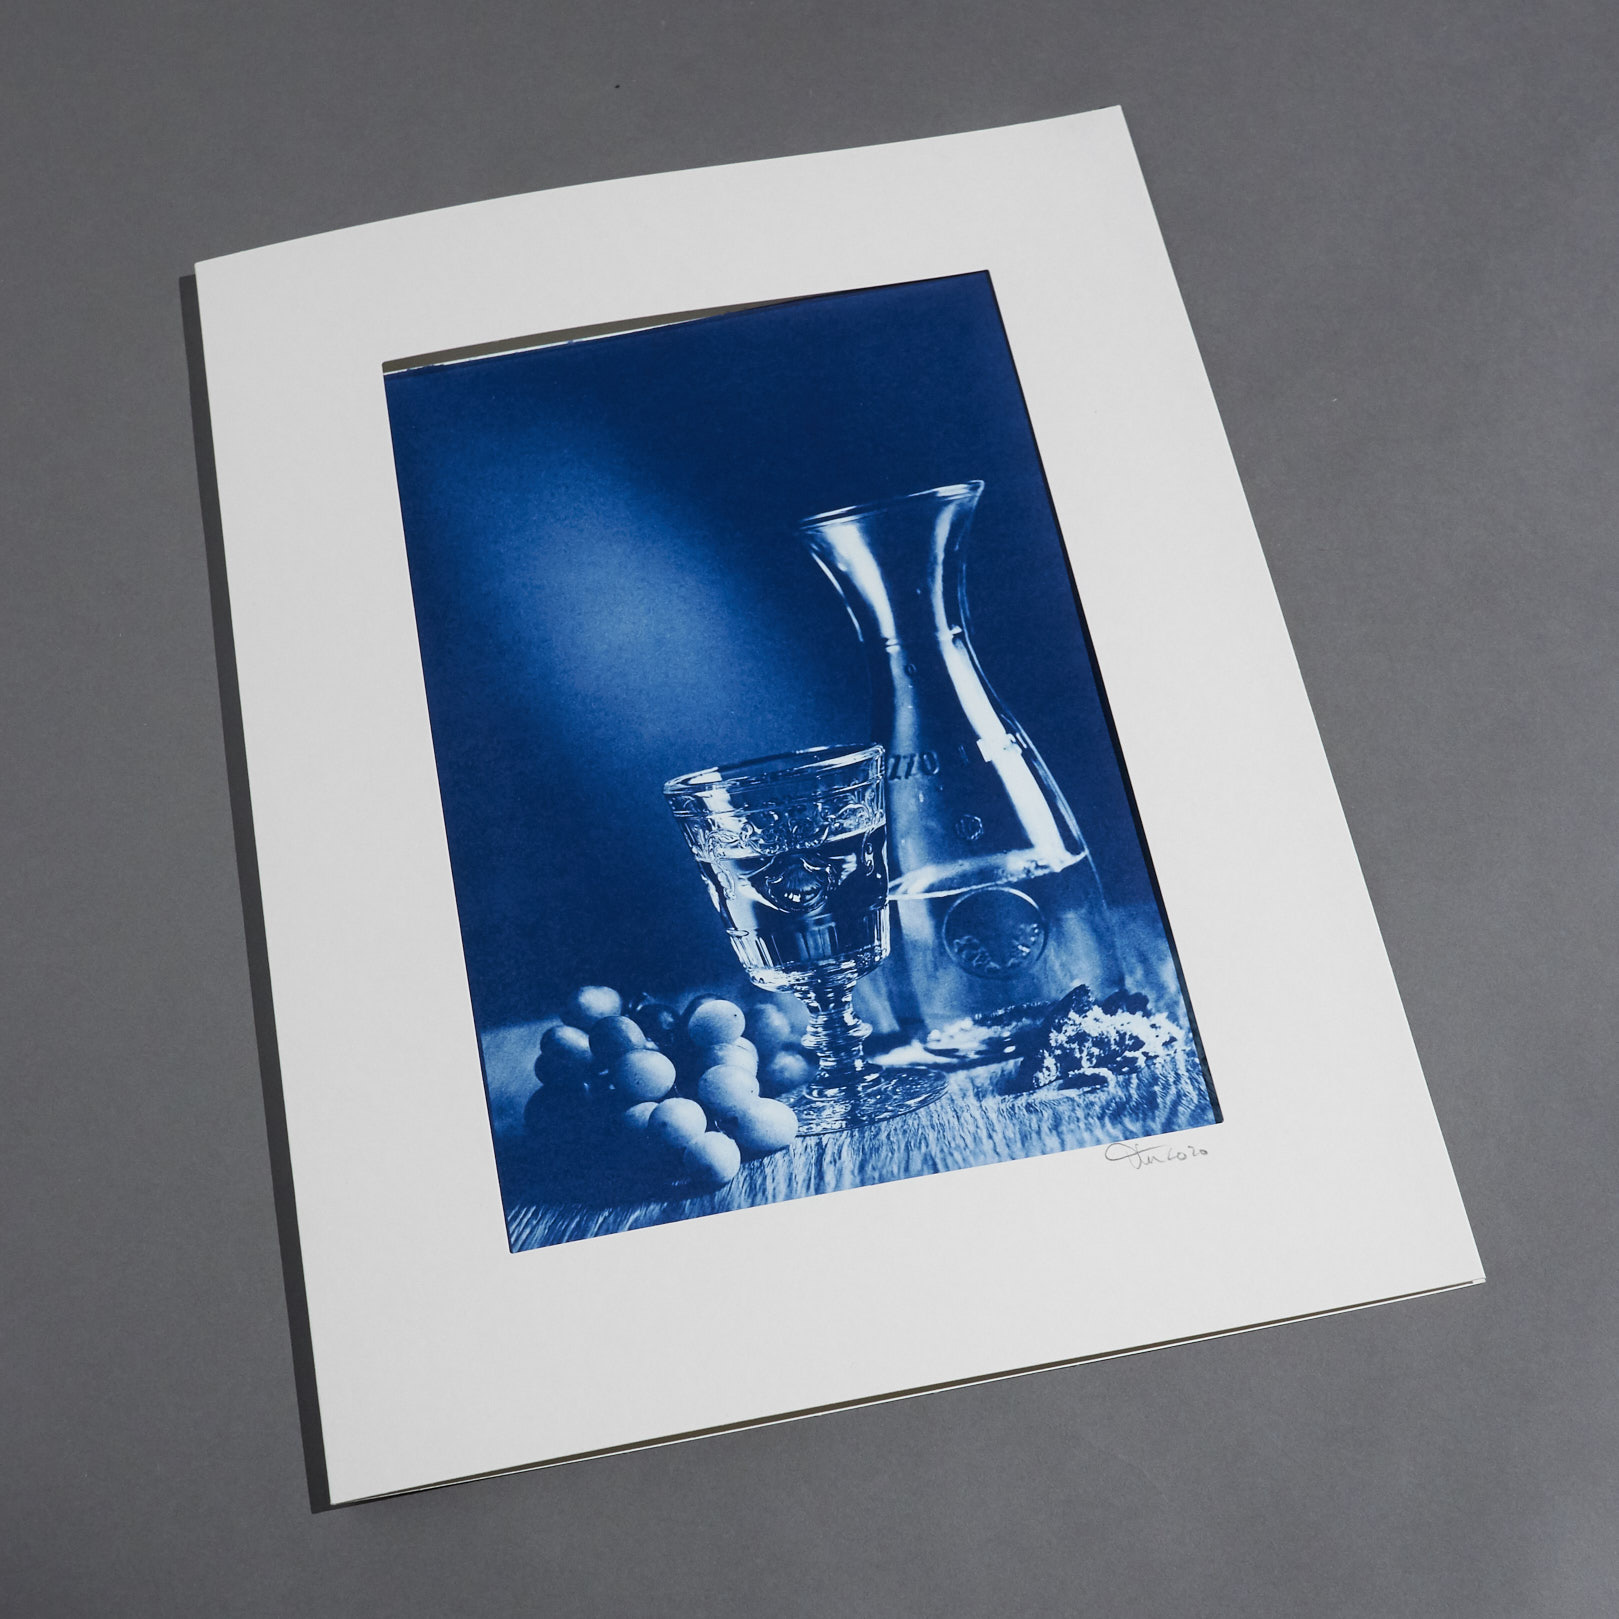 Cyanotype Thilo Nass_DSC9339